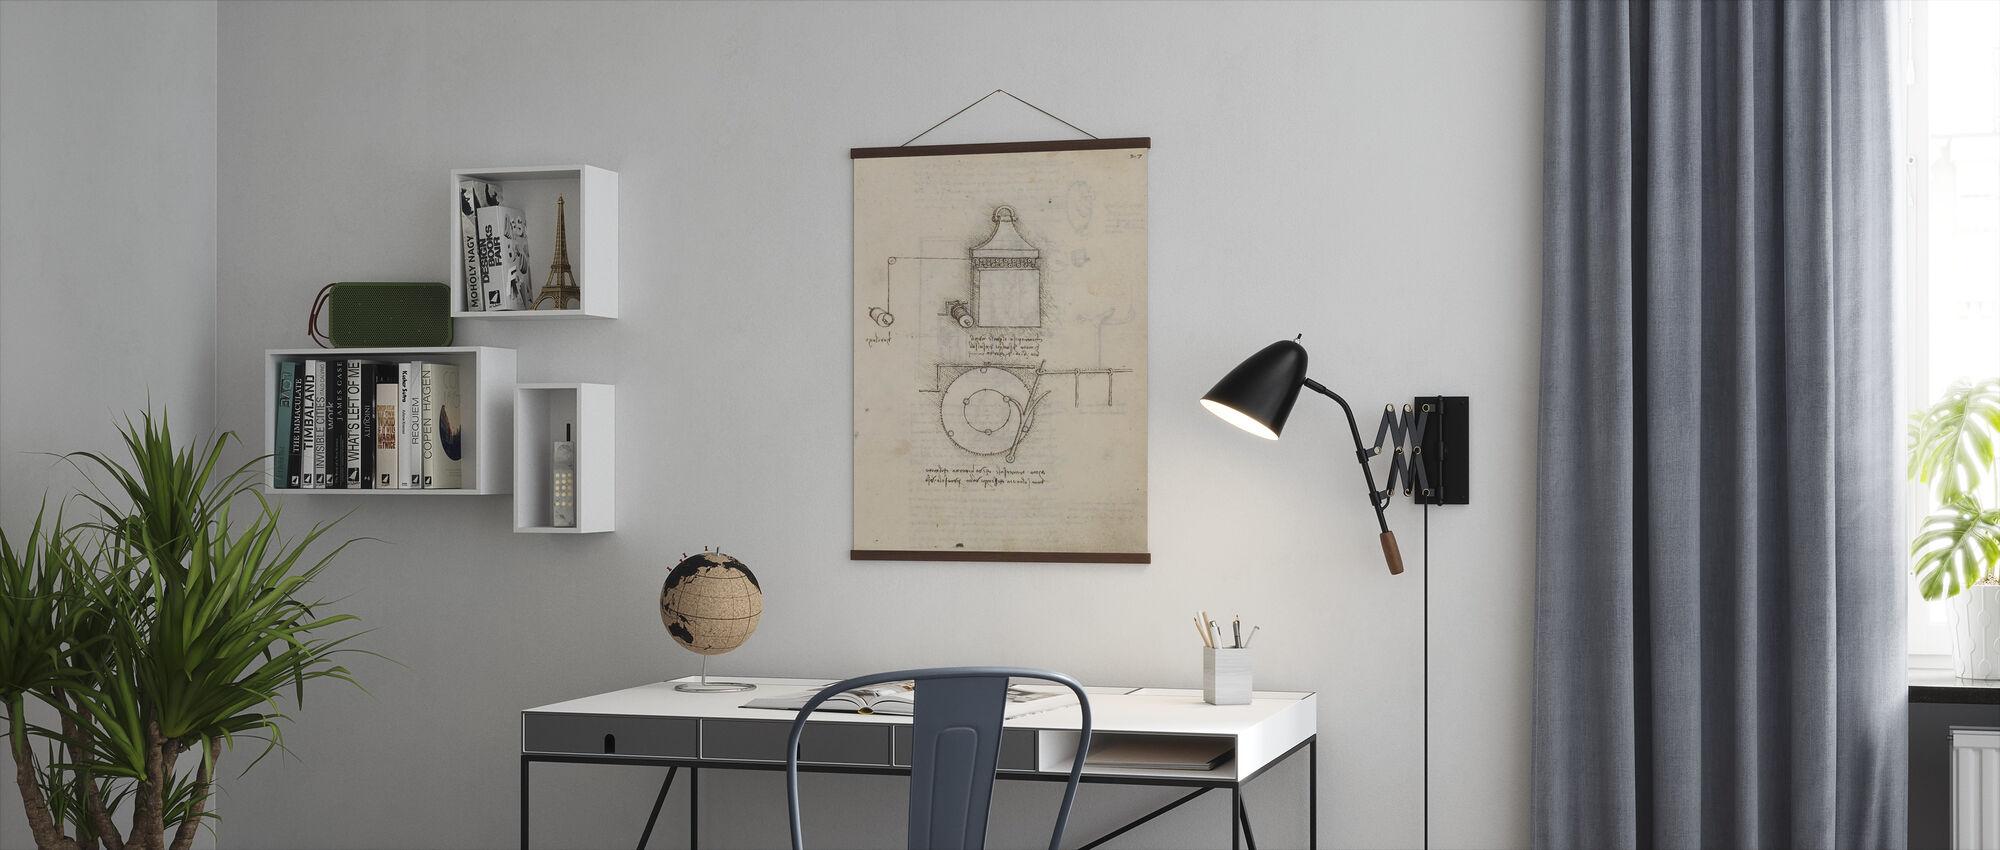 Pulley System - Leonardo Da Vinci - Poster - Office